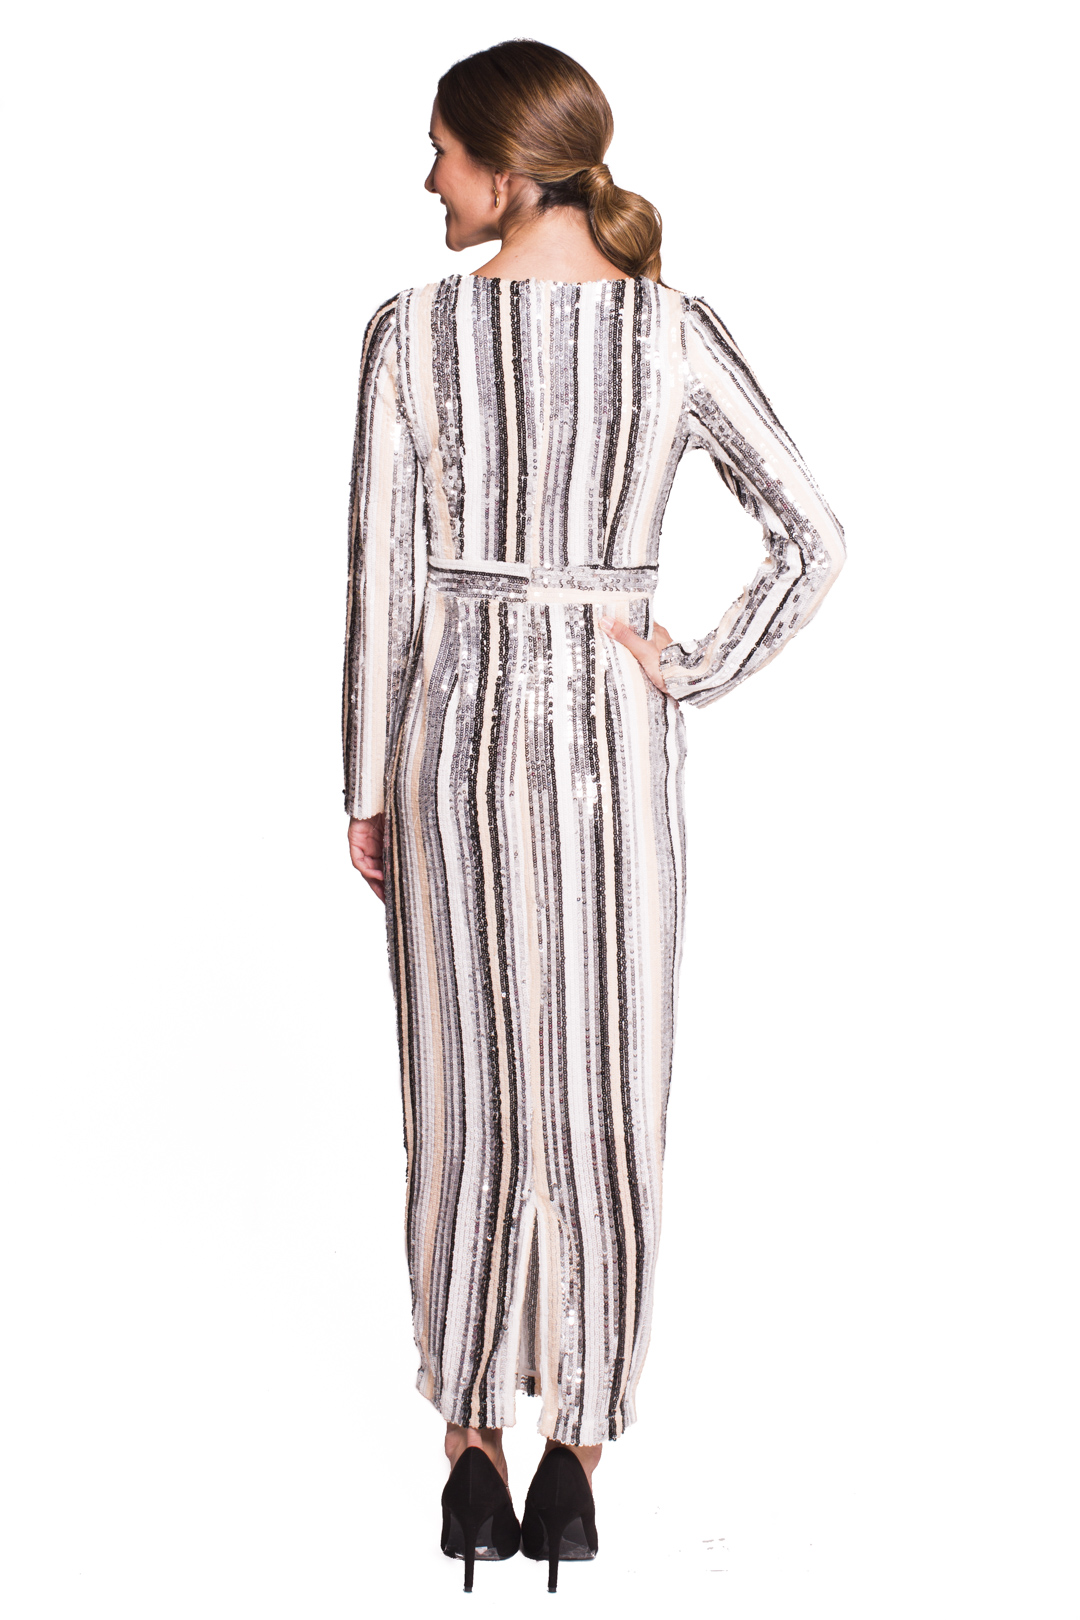 left - Vestido Sequins Striped